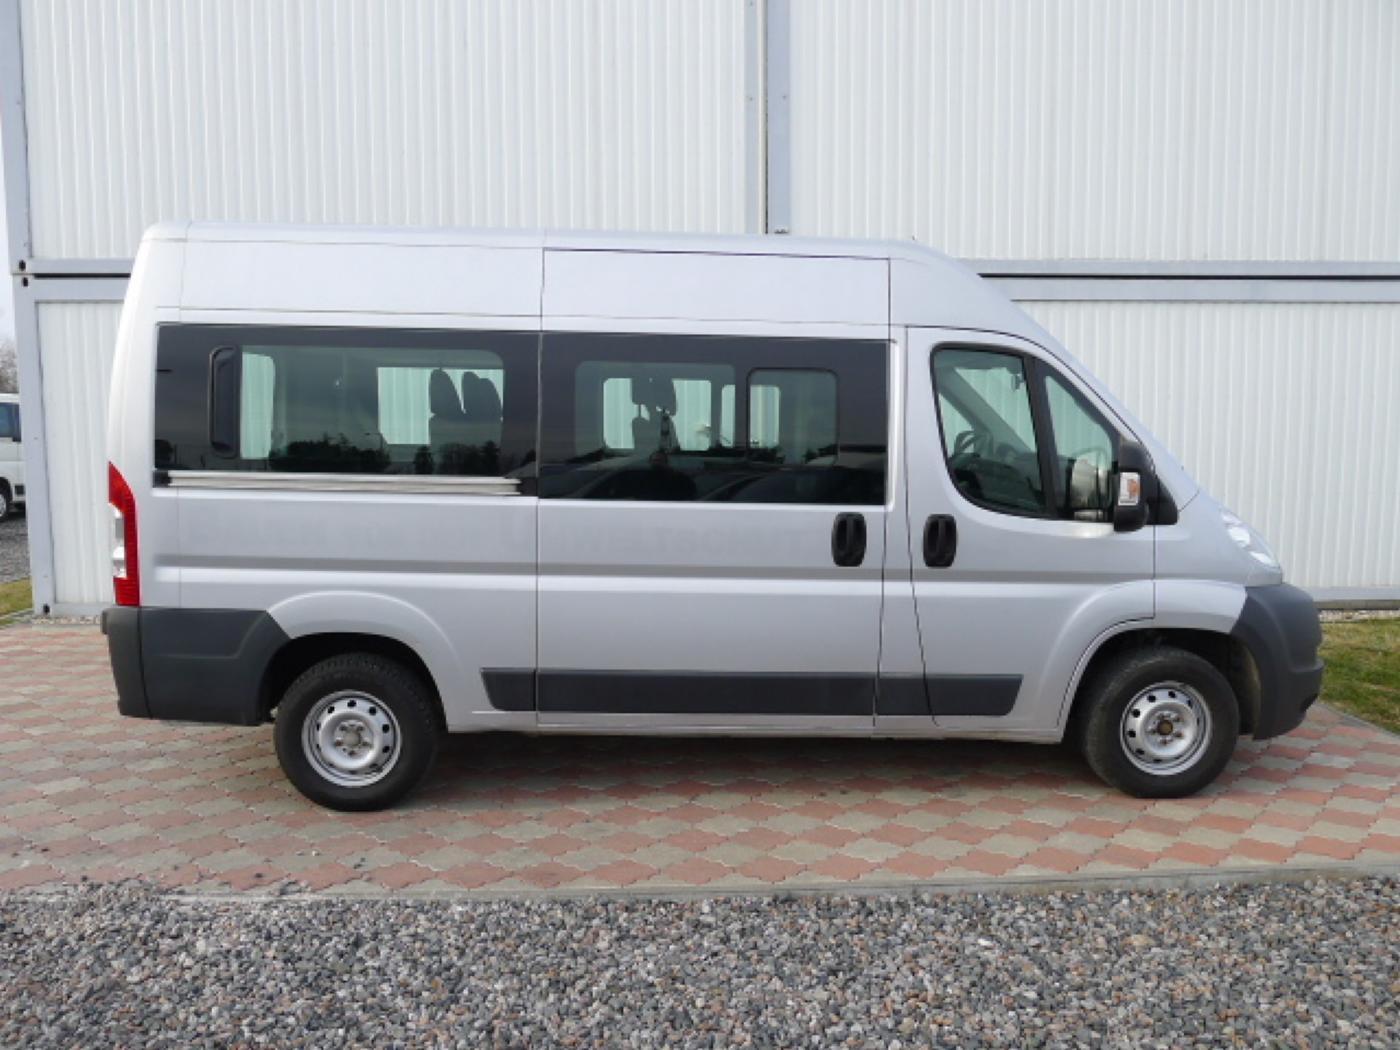 Peugeot Boxer 2,2 HDI PANORAMA 8míst+2 x klima+We - 2